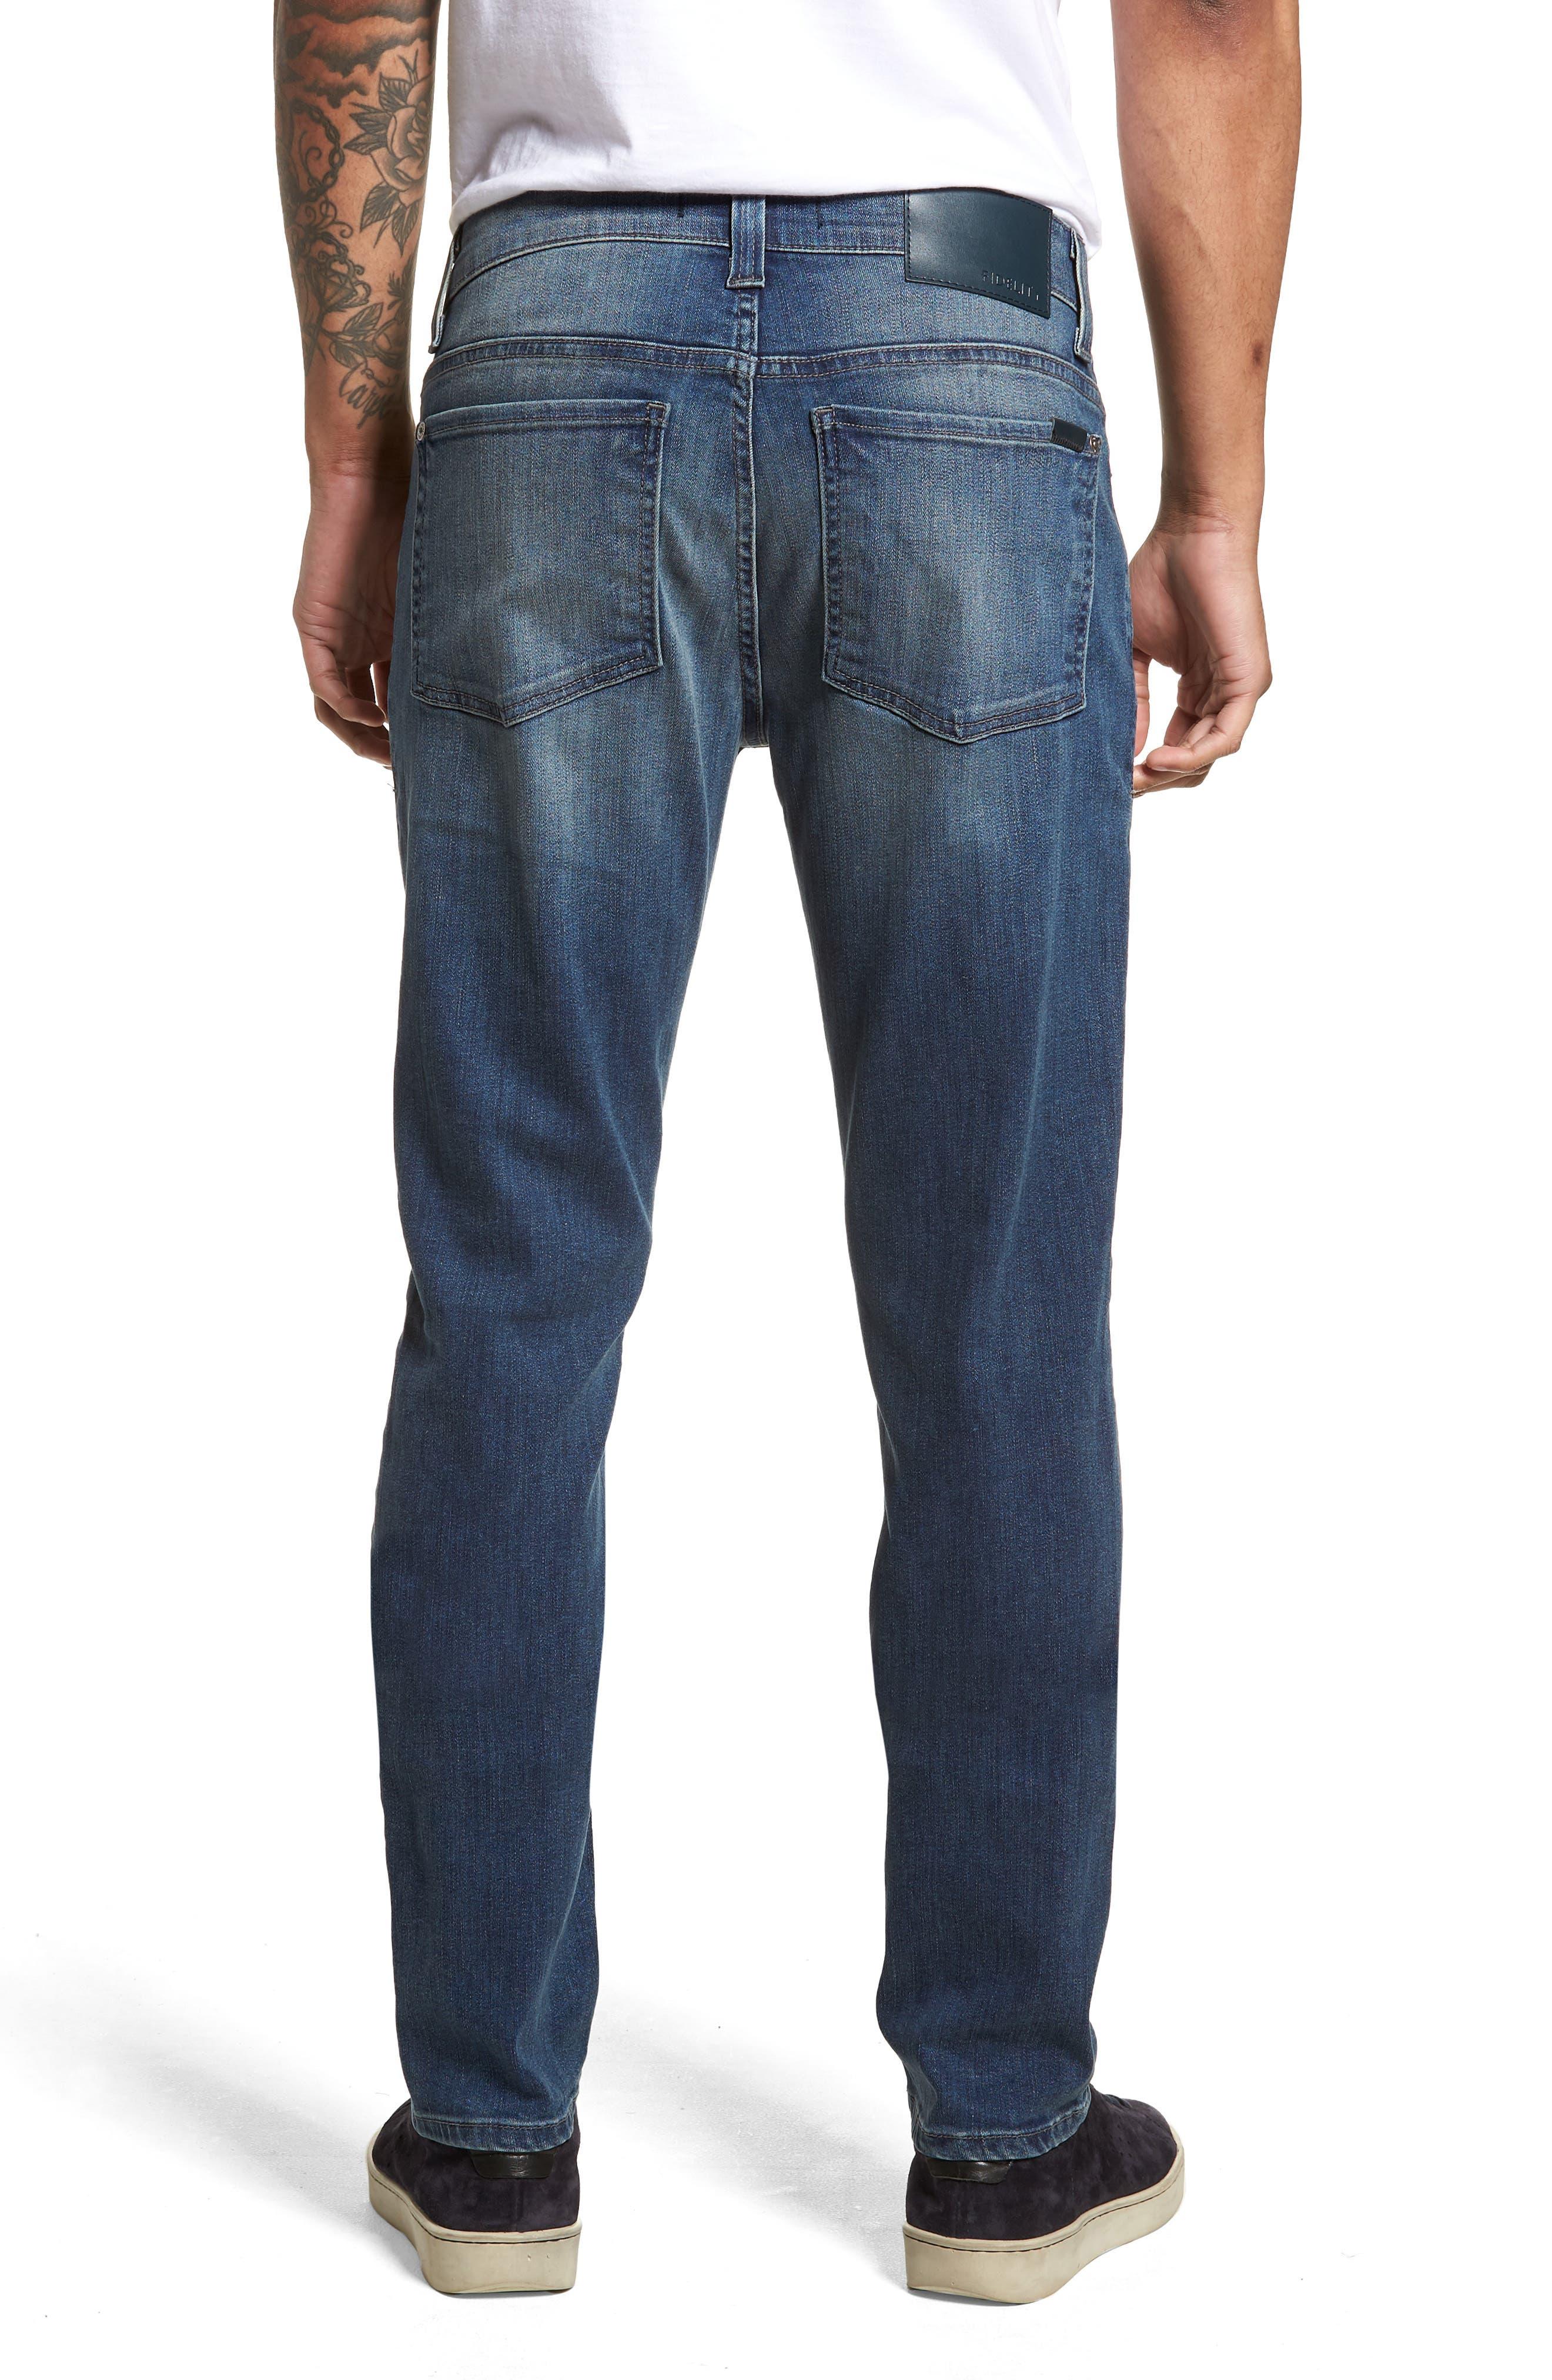 Torino Slim Fit Jeans,                             Alternate thumbnail 2, color,                             Atlas Blue